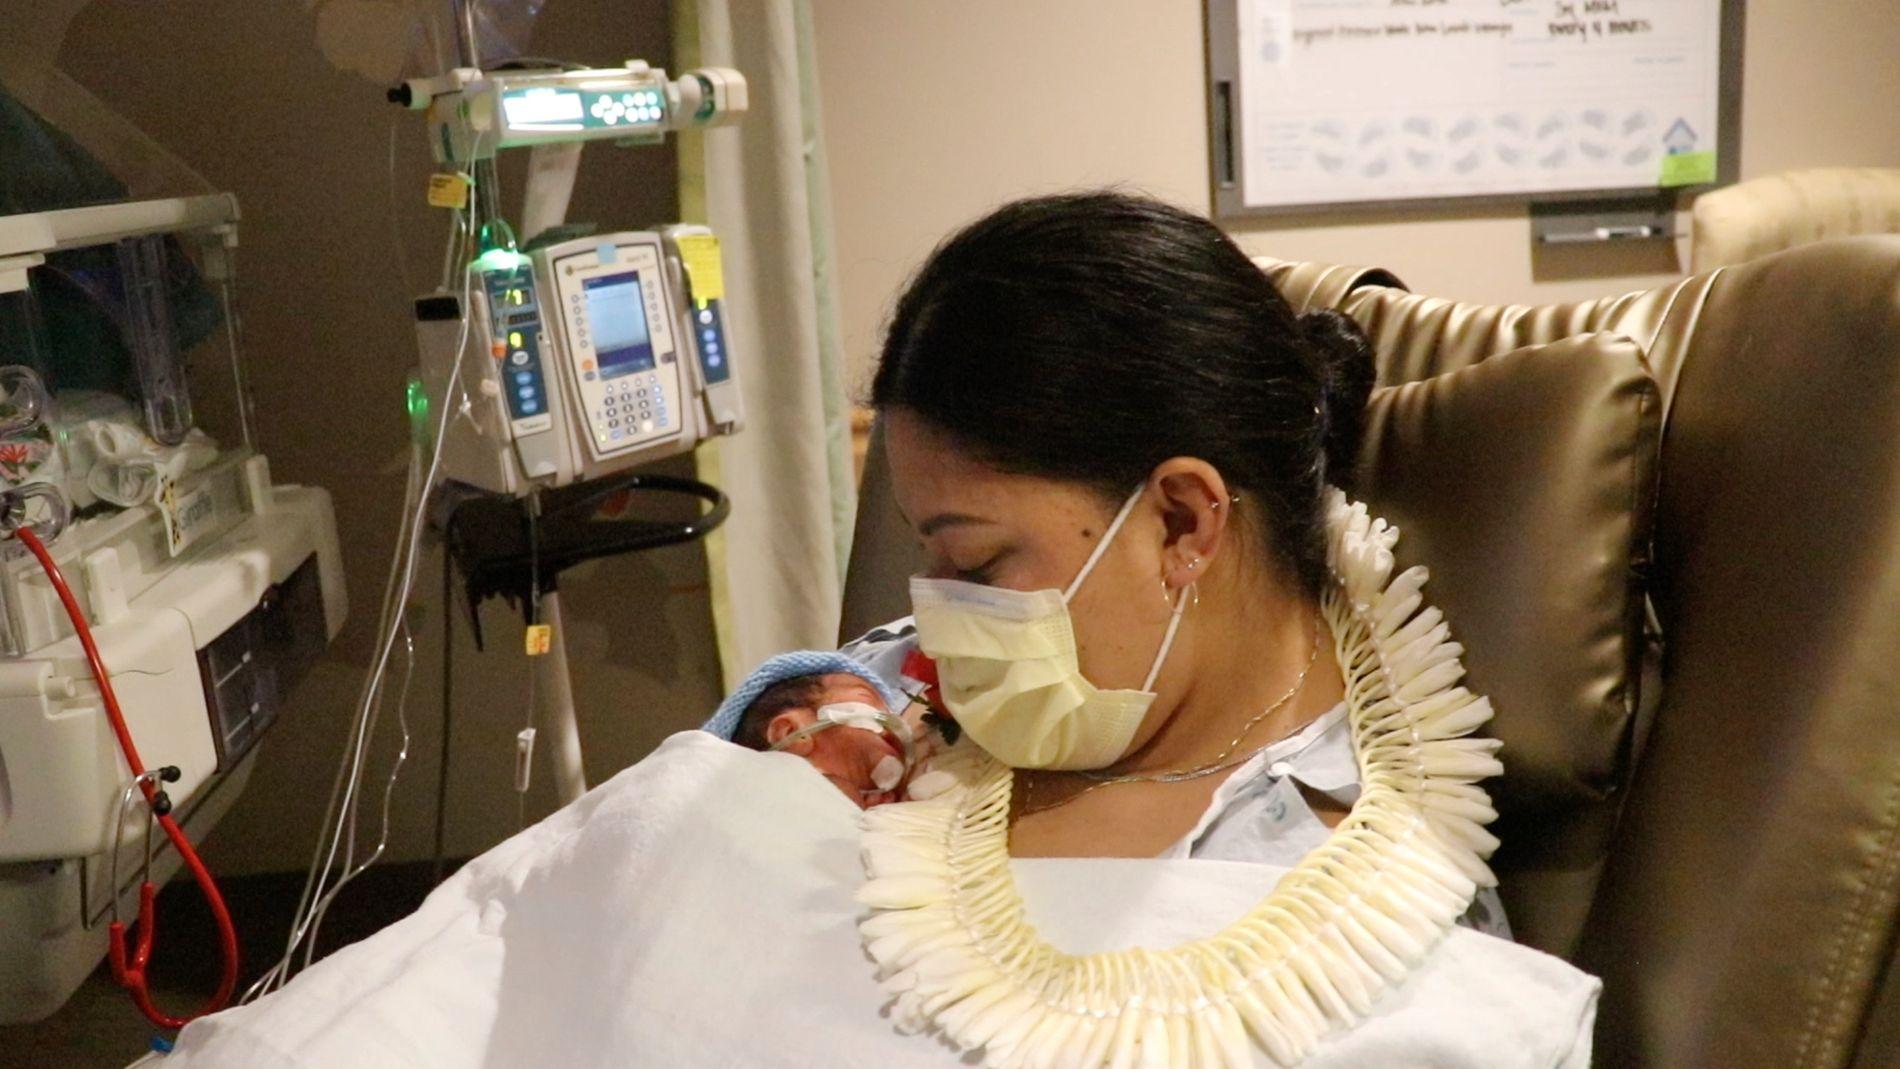 Var gravid i uke 29 – fødte på fly